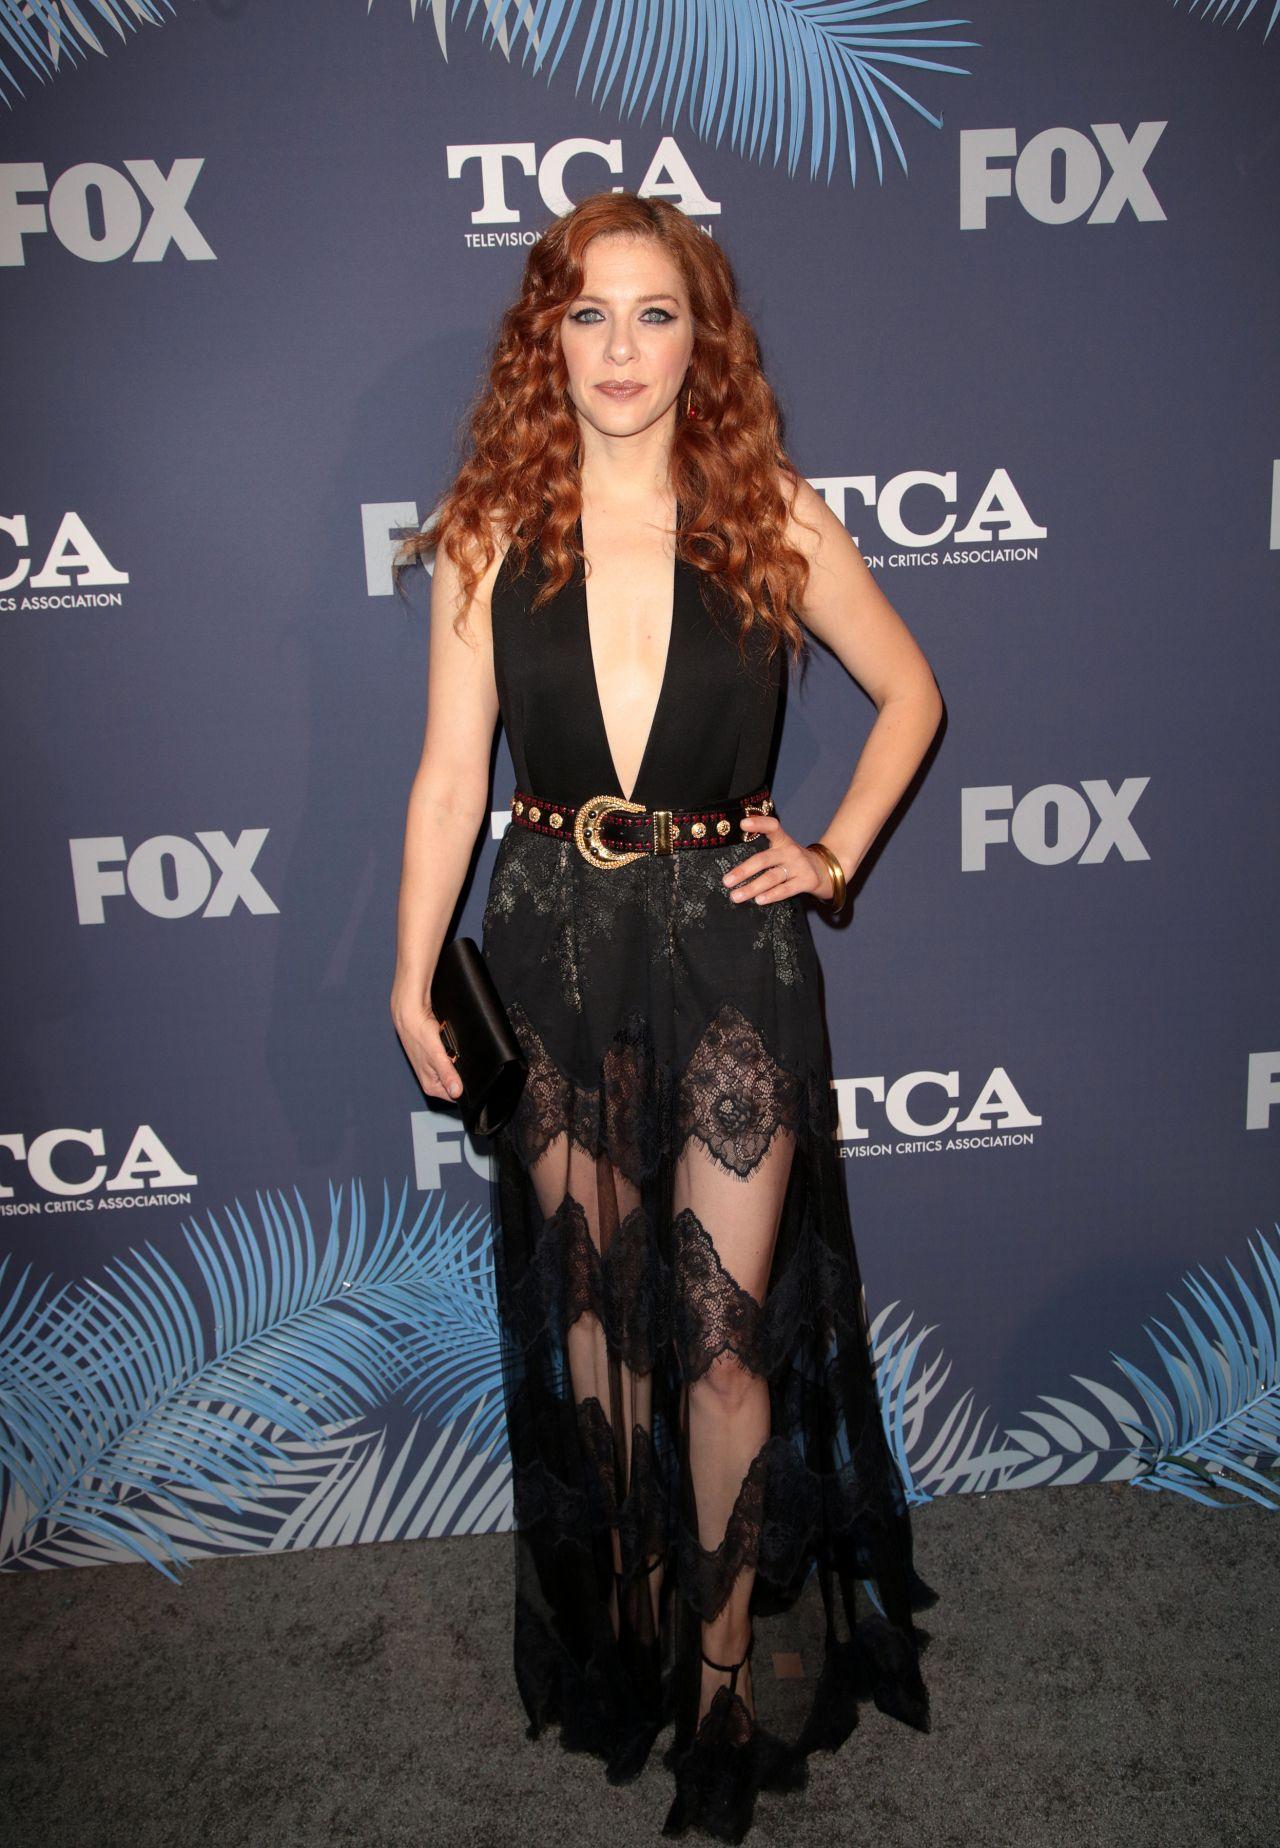 Rachelle Lefevre Fox Summer Tca 2018 All Star Party In